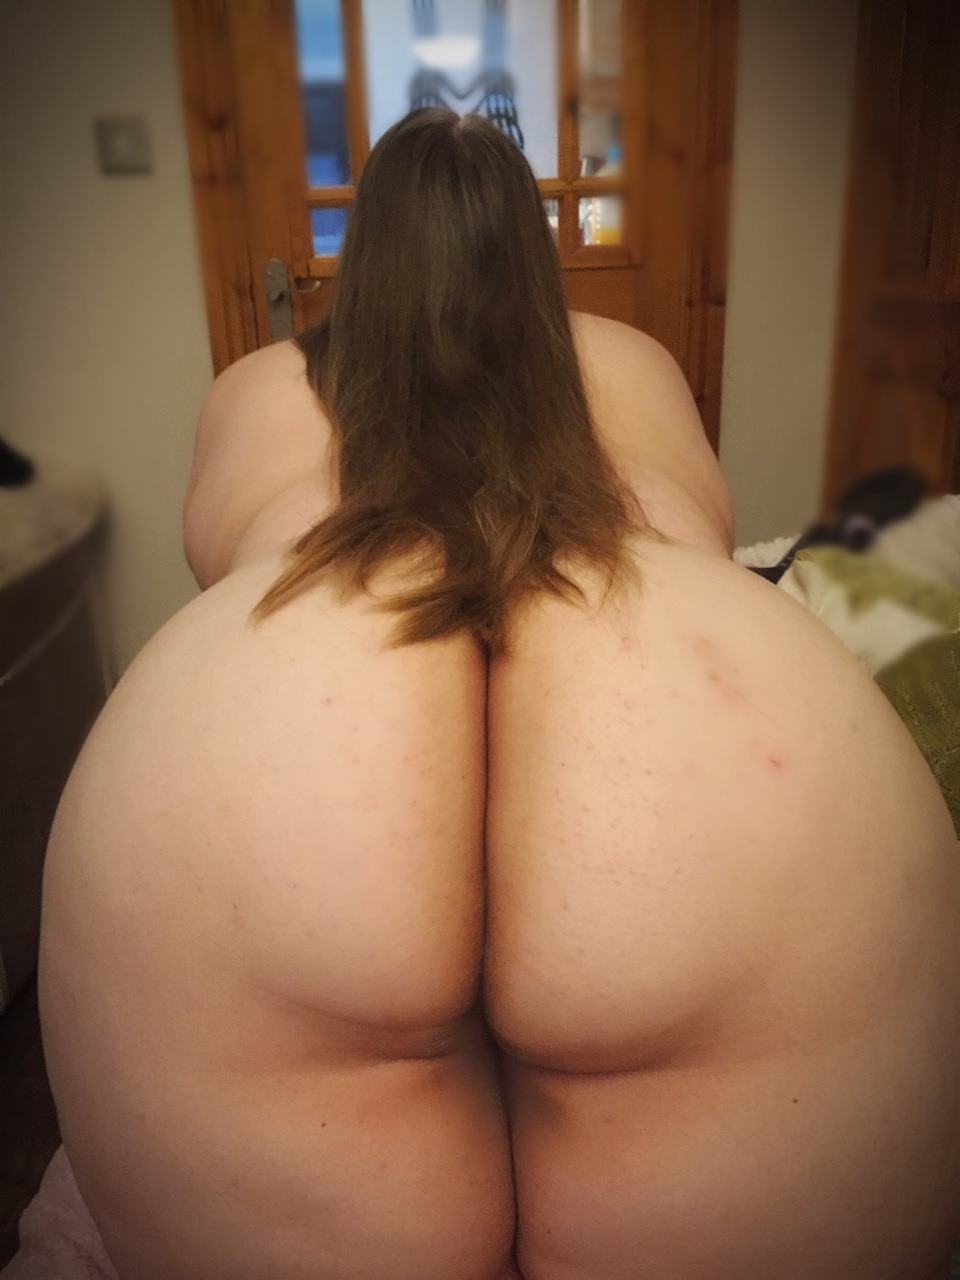 free sex videos of fat women